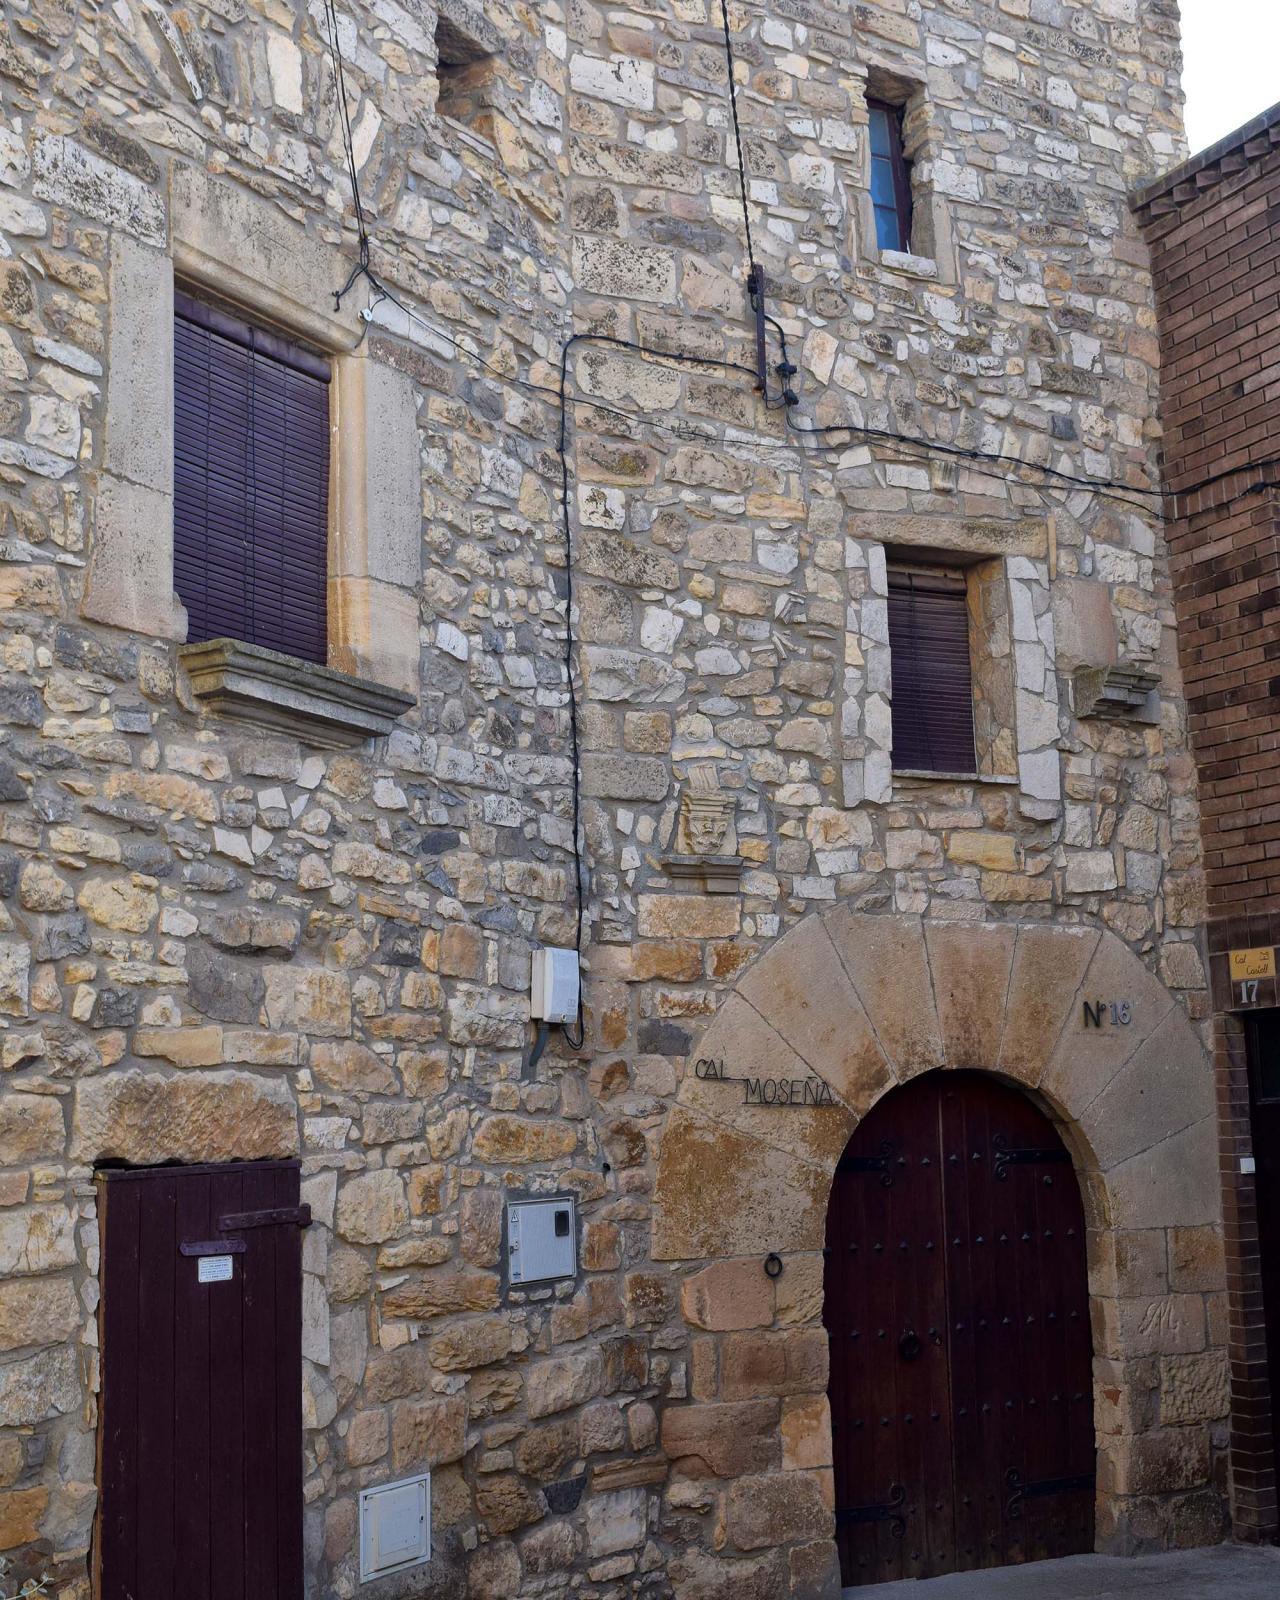 Castle of Cal Mosenya